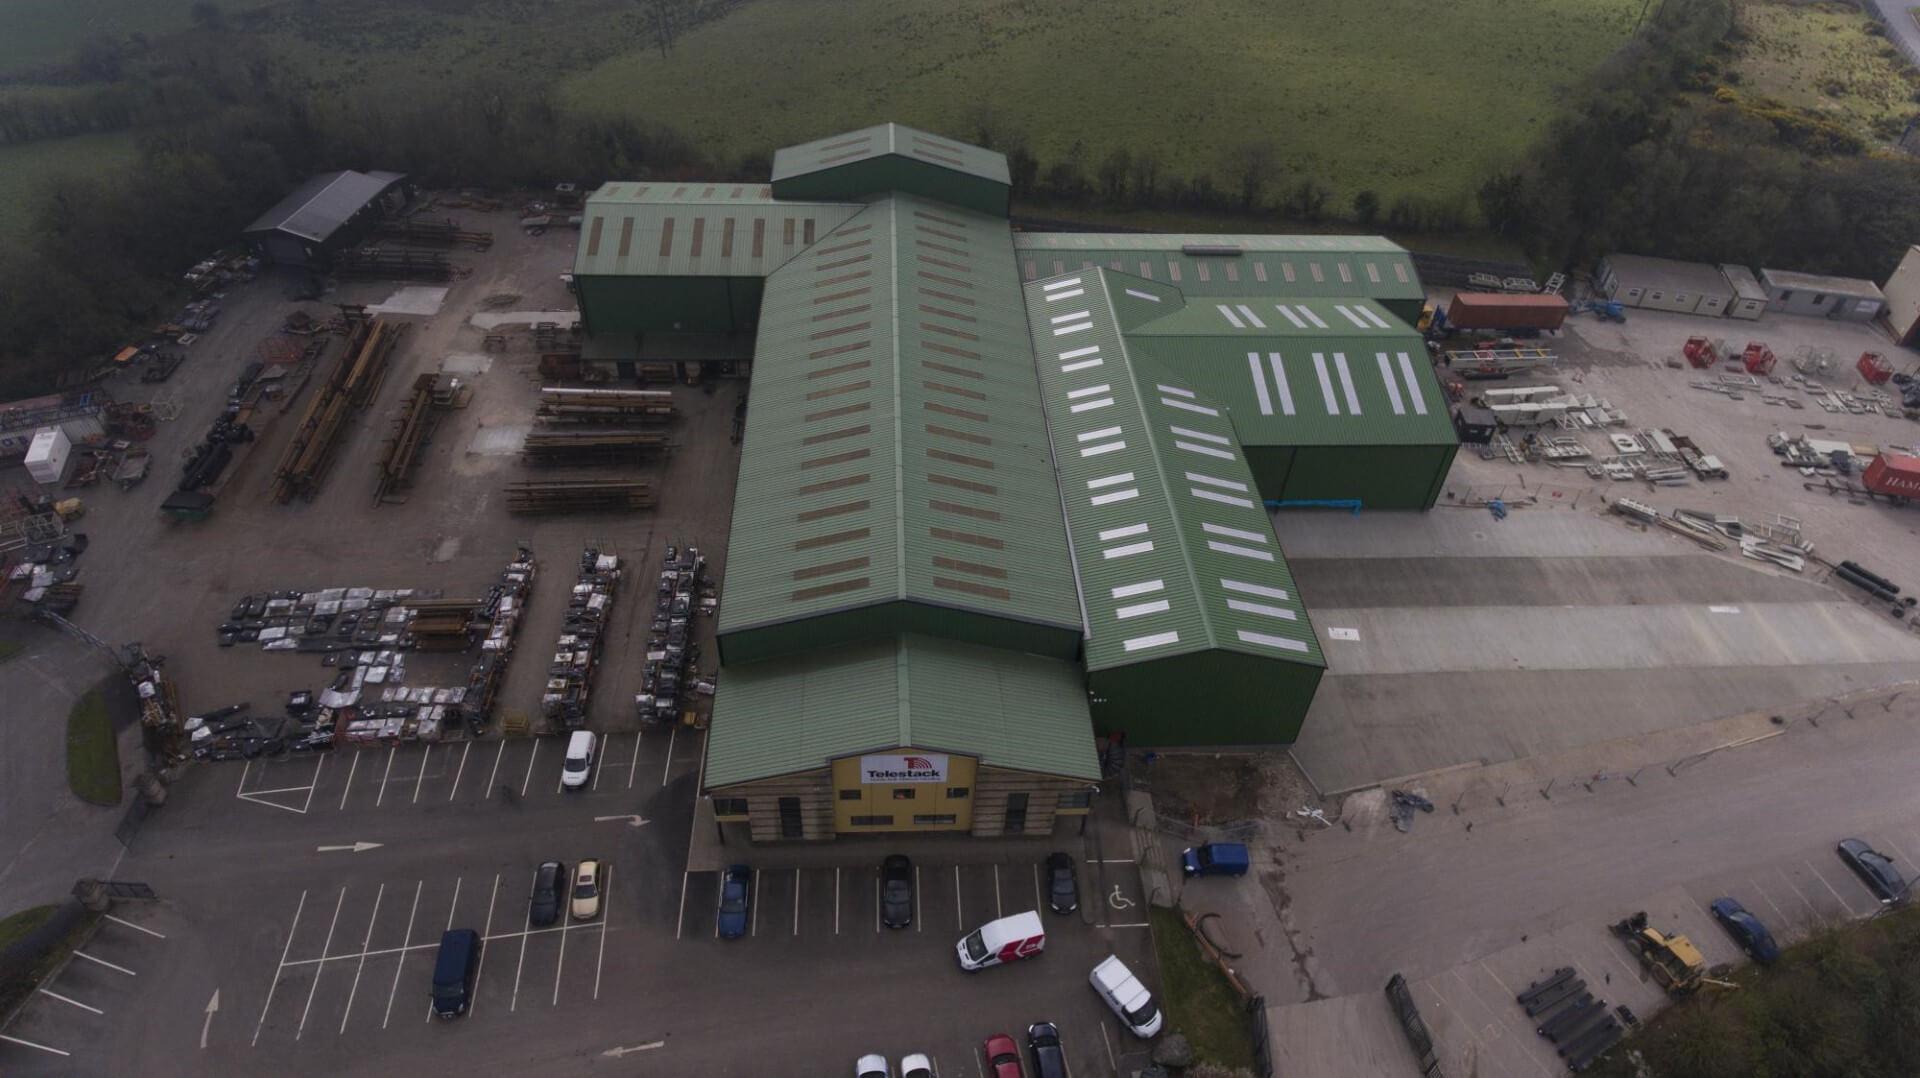 Telestack opent nieuwe straal- en spuiterij in Omagh